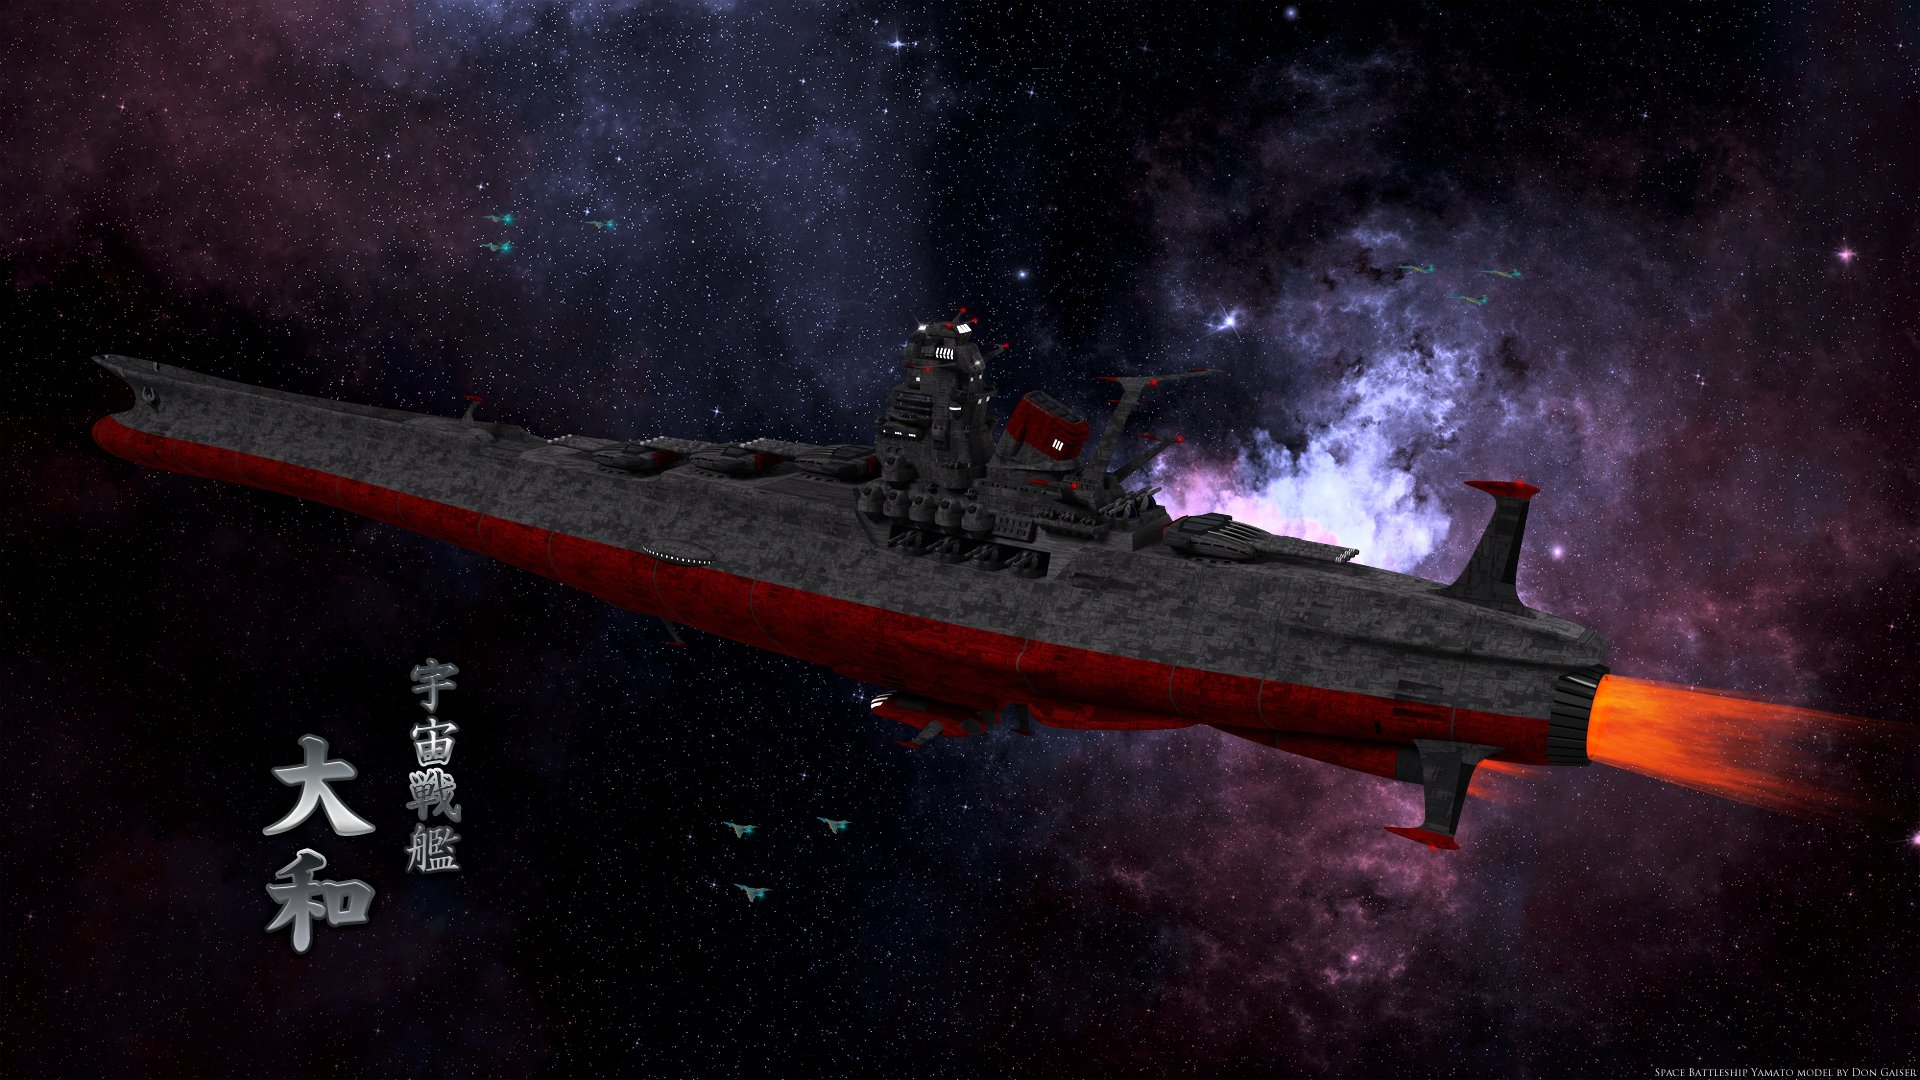 Blueprint Wallpaper Iphone 6 Space Battleship Yamato Anime Sci Fi Science Fiction